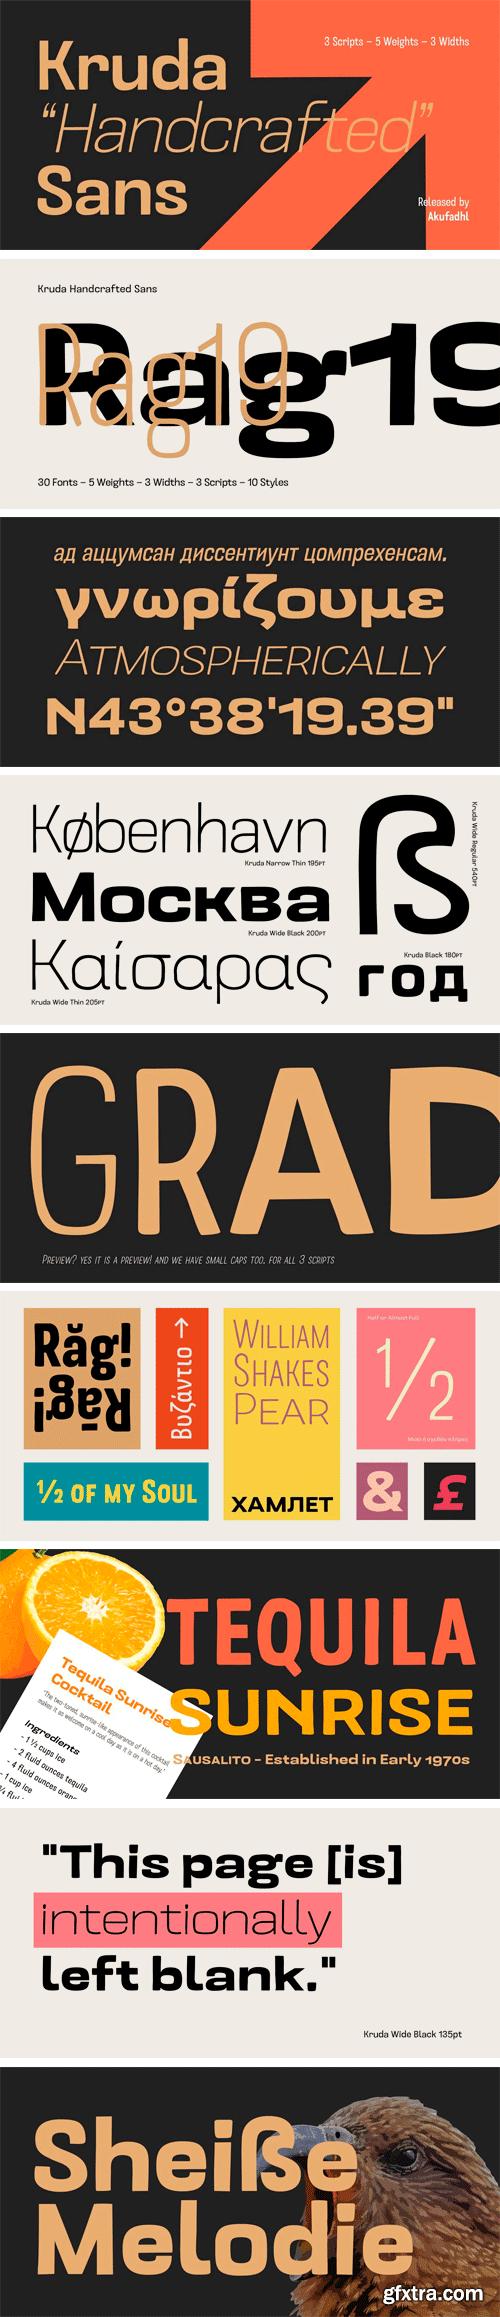 Kruda Handcrafted Sans Font Family